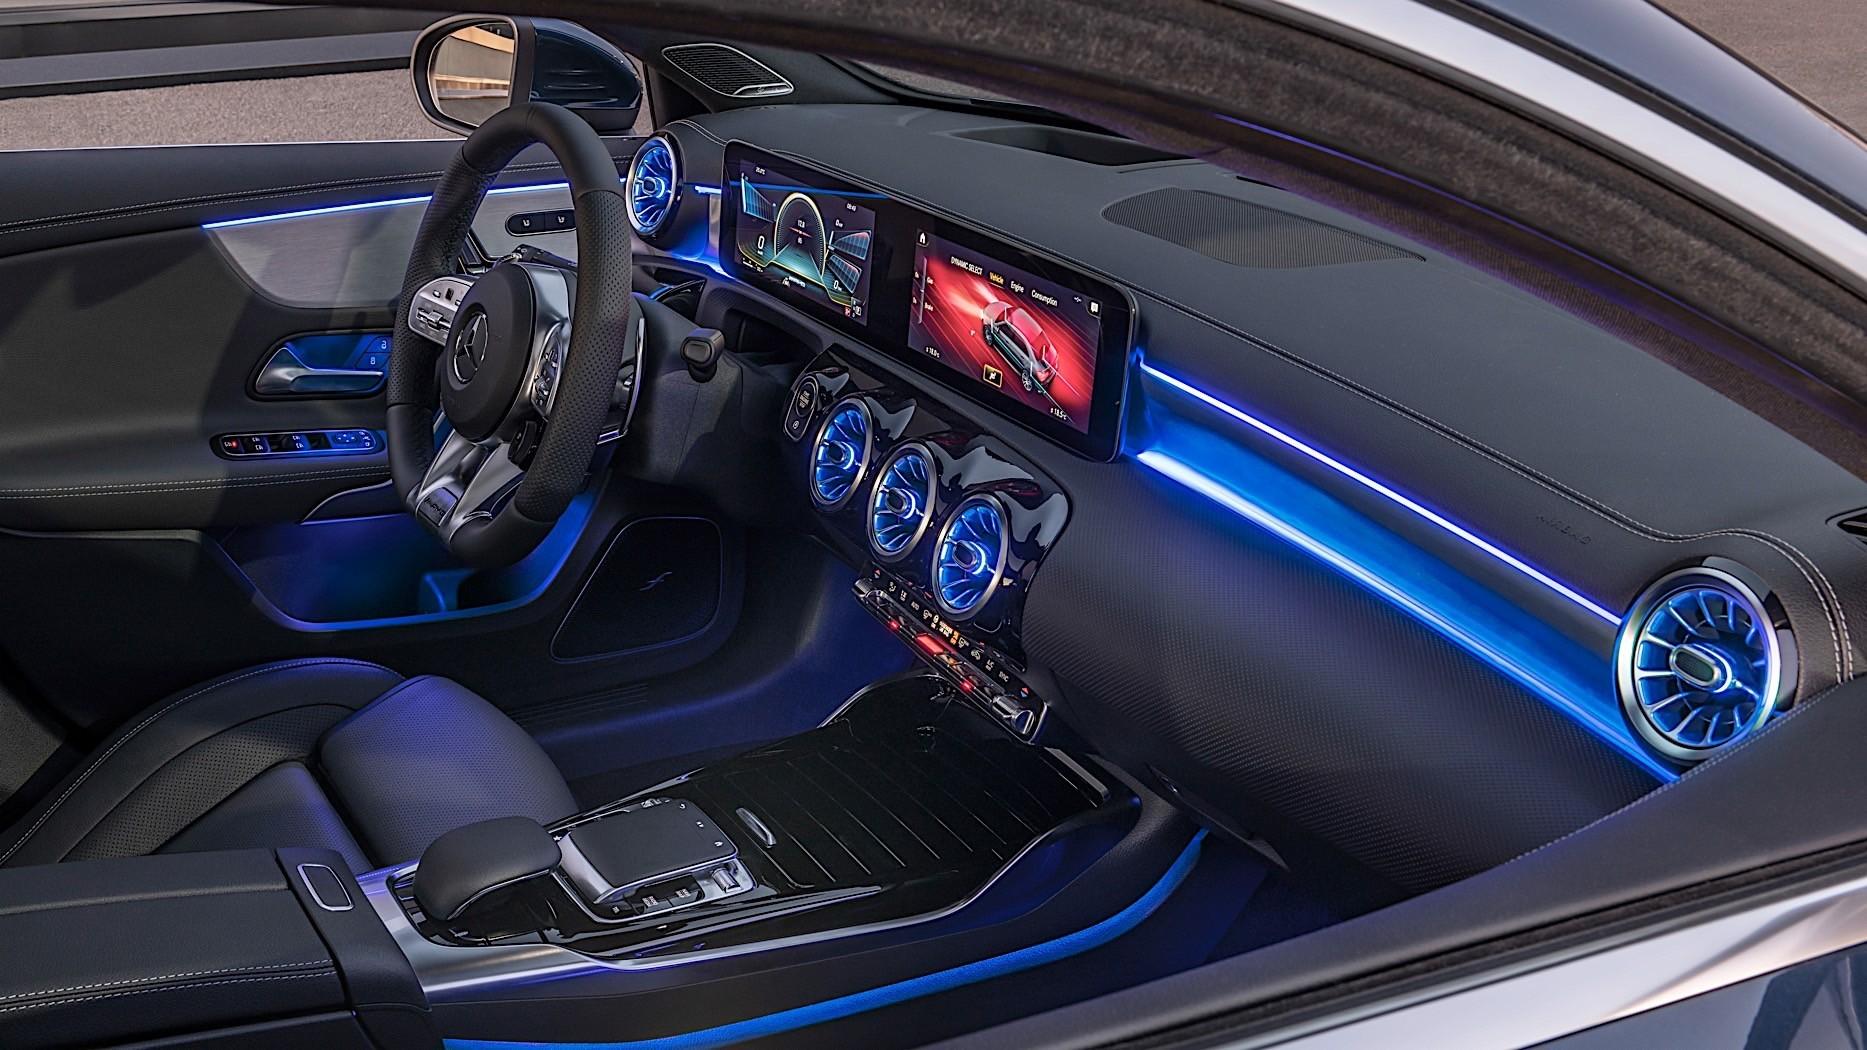 2020 mercedes-amg a 35 sedan review